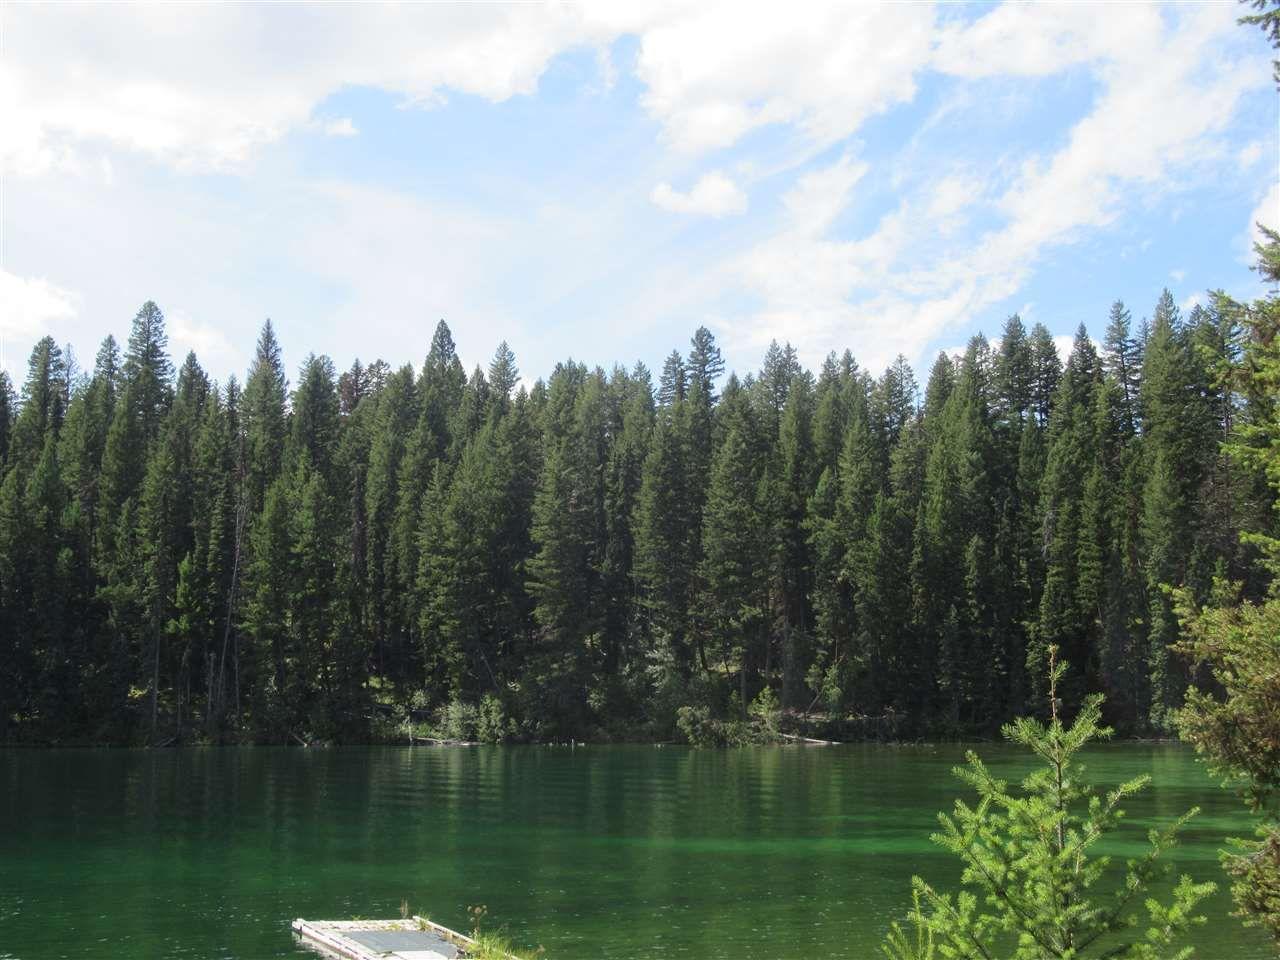 Photo 6: Photos: 2454 TYEE LAKE Road in Williams Lake: Williams Lake - Rural North House for sale (Williams Lake (Zone 27))  : MLS®# R2398466